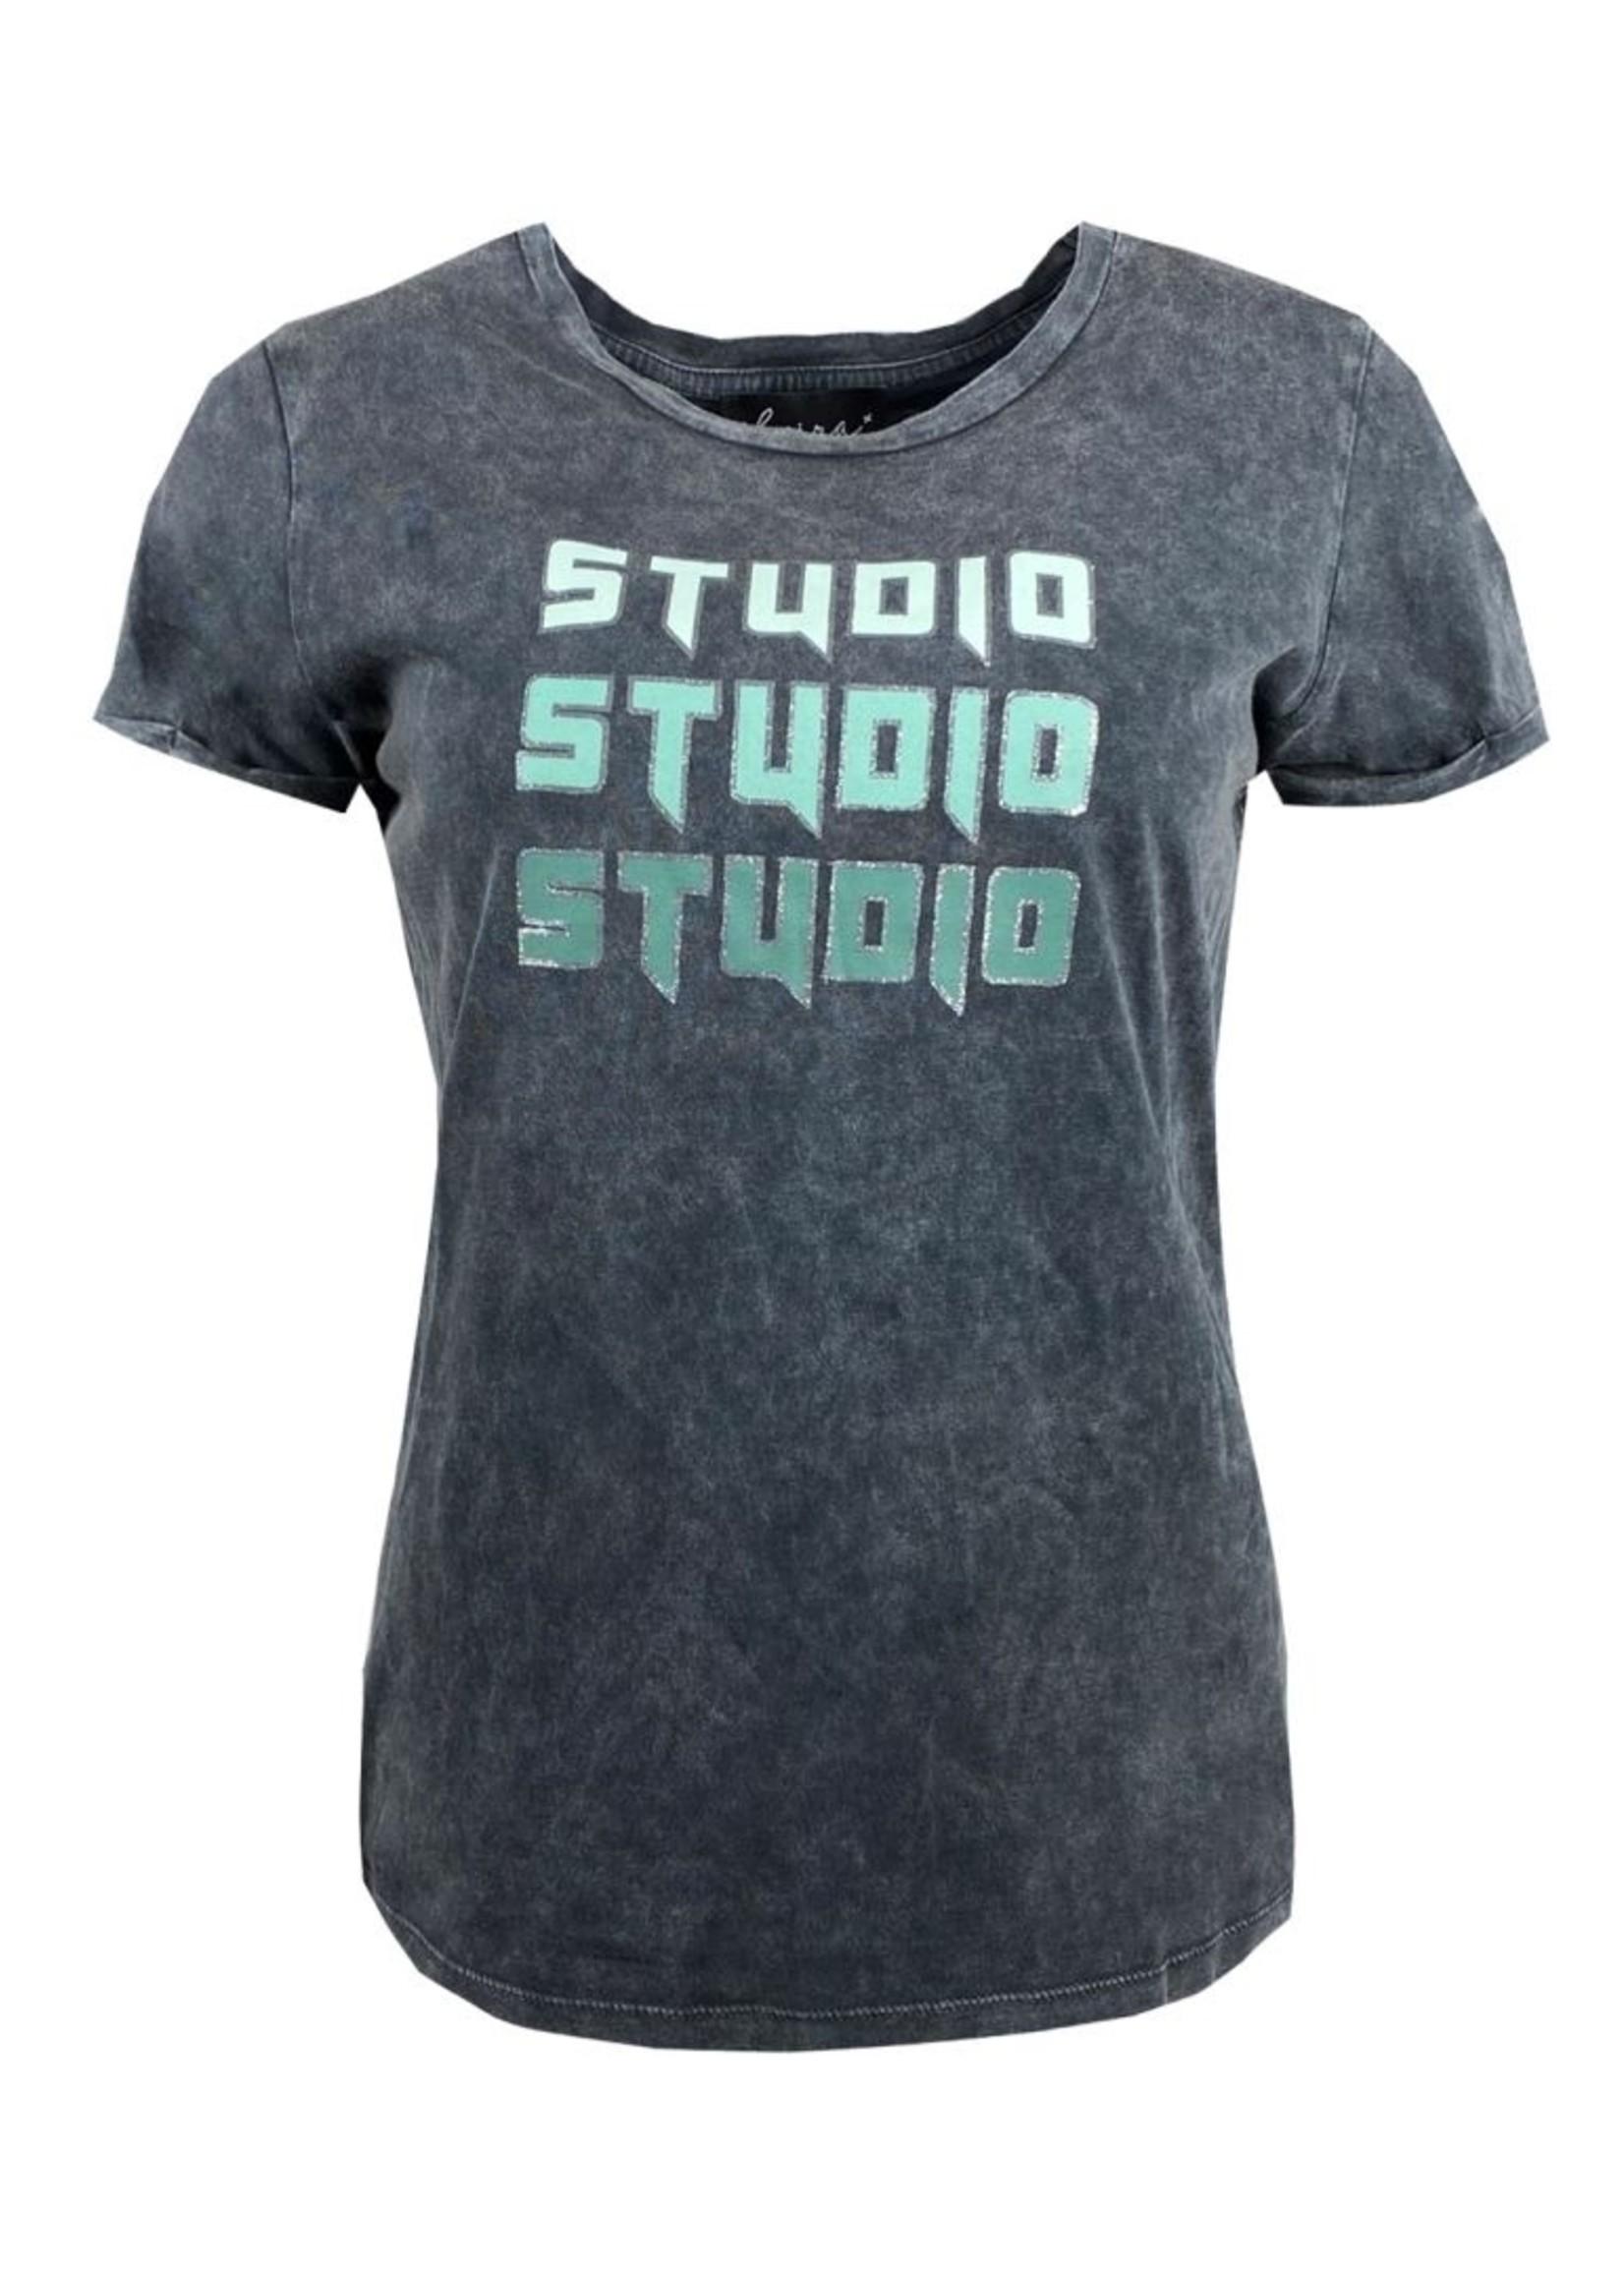 Elvira Collections Elvira Collections Studio T-shirt